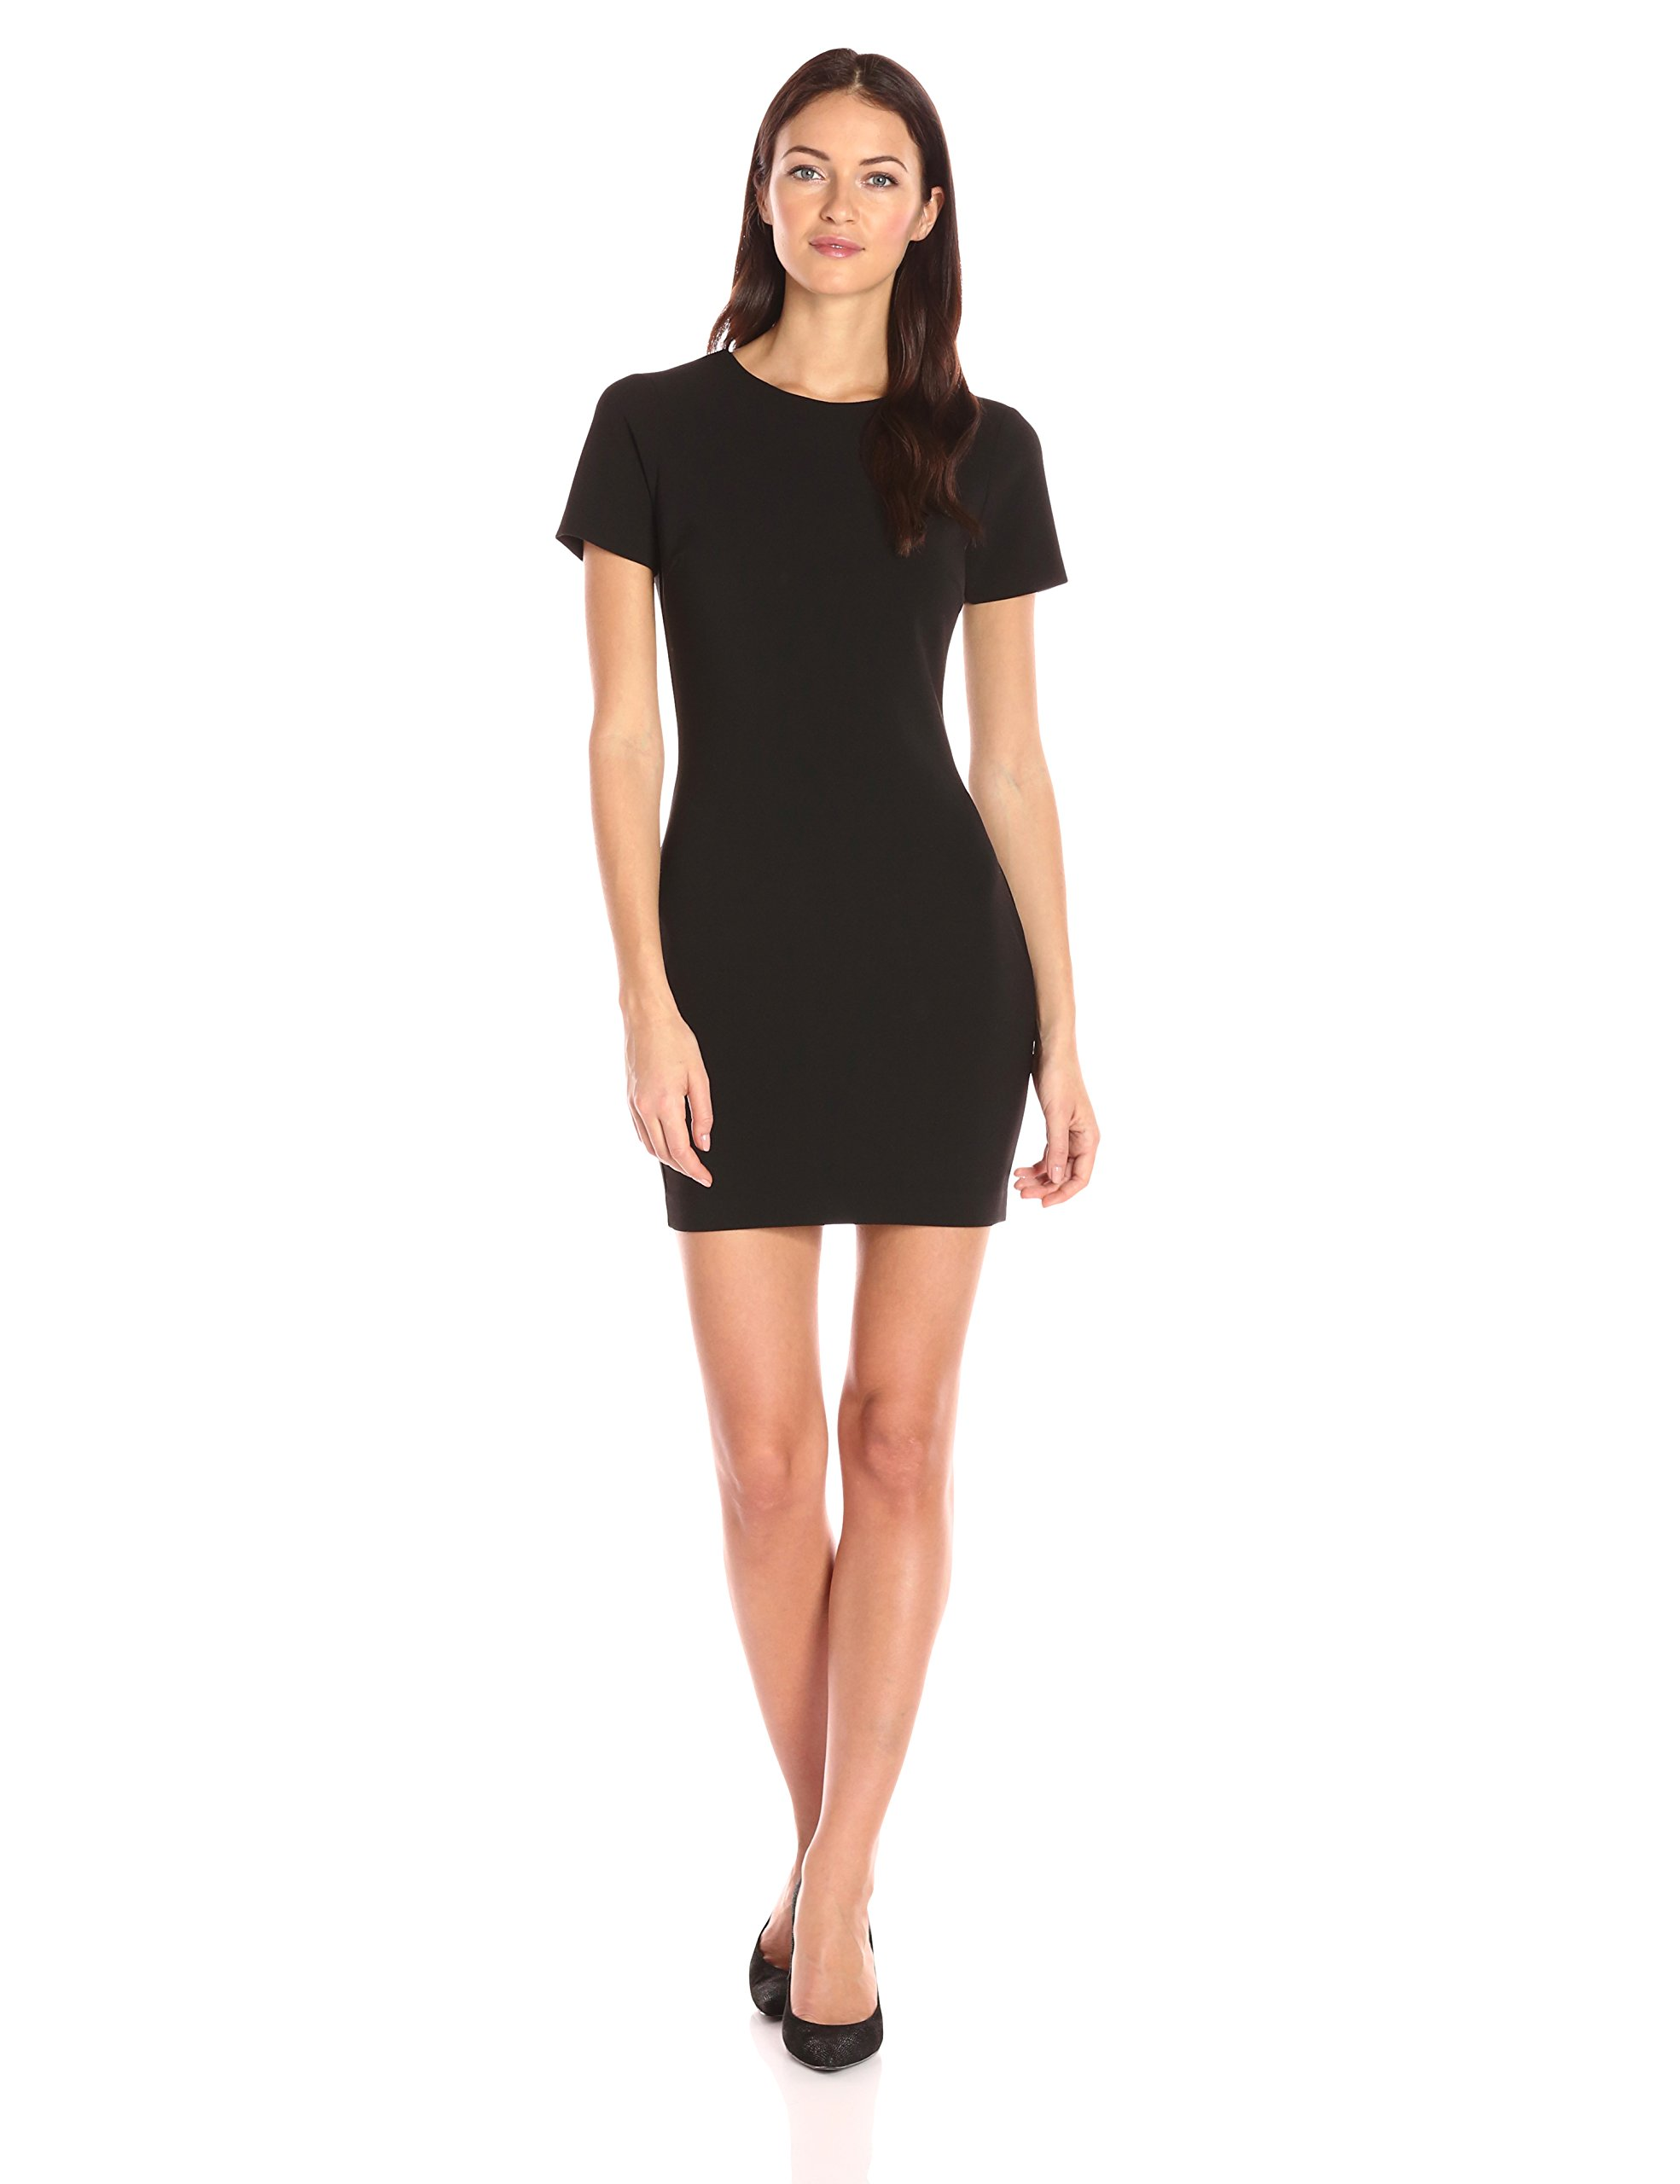 LIKELY Women's Manhattan Dress, Black, 10